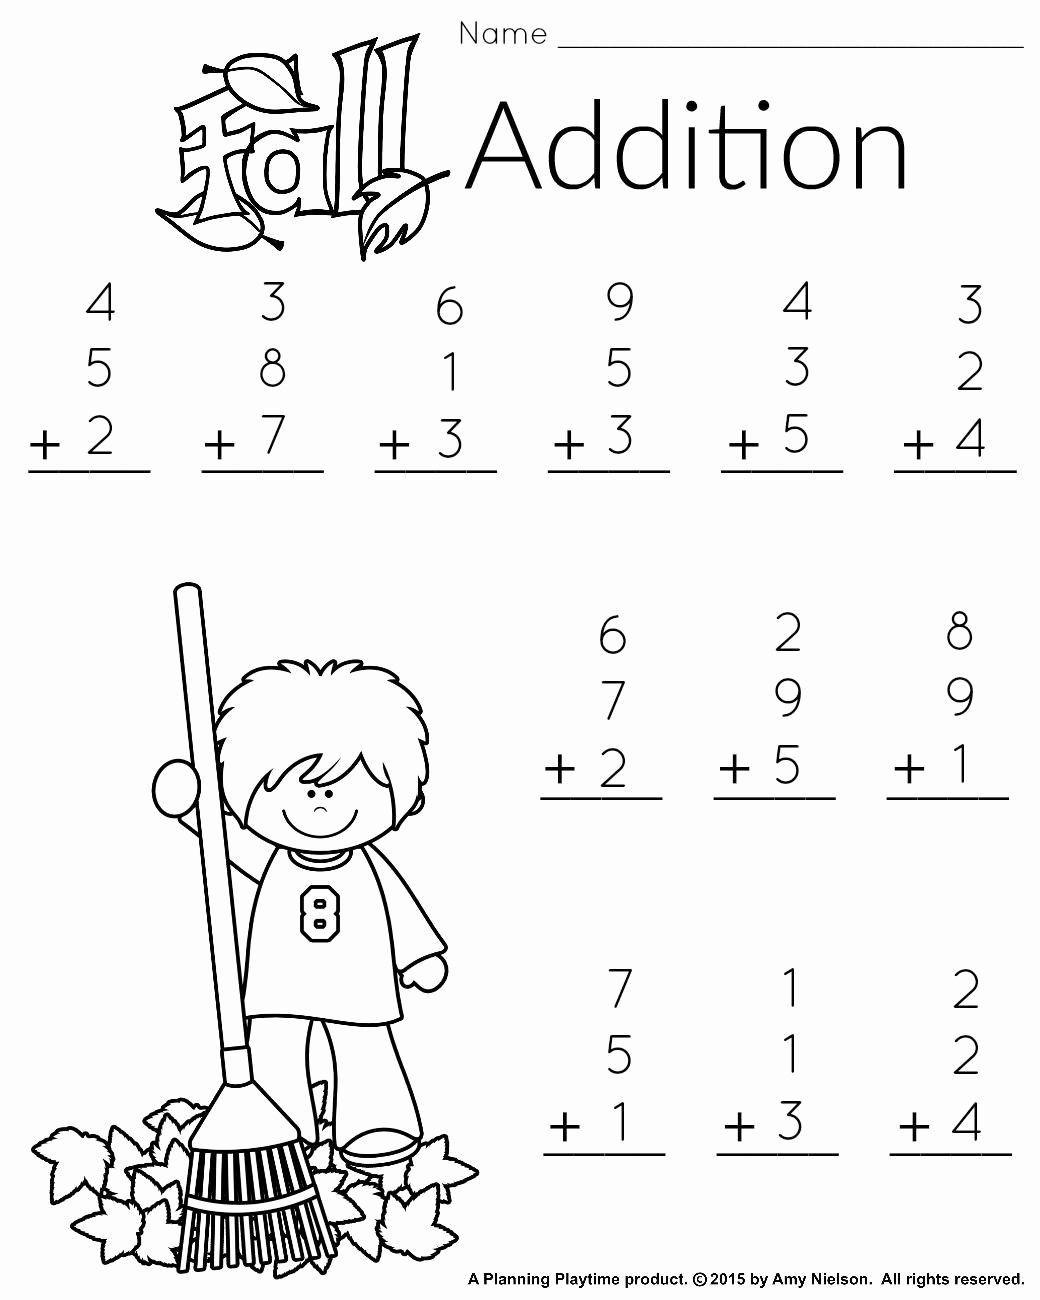 Coloring Activities English คณิตศาสตร์, แบบฝึกหัดเด็ก, เกม